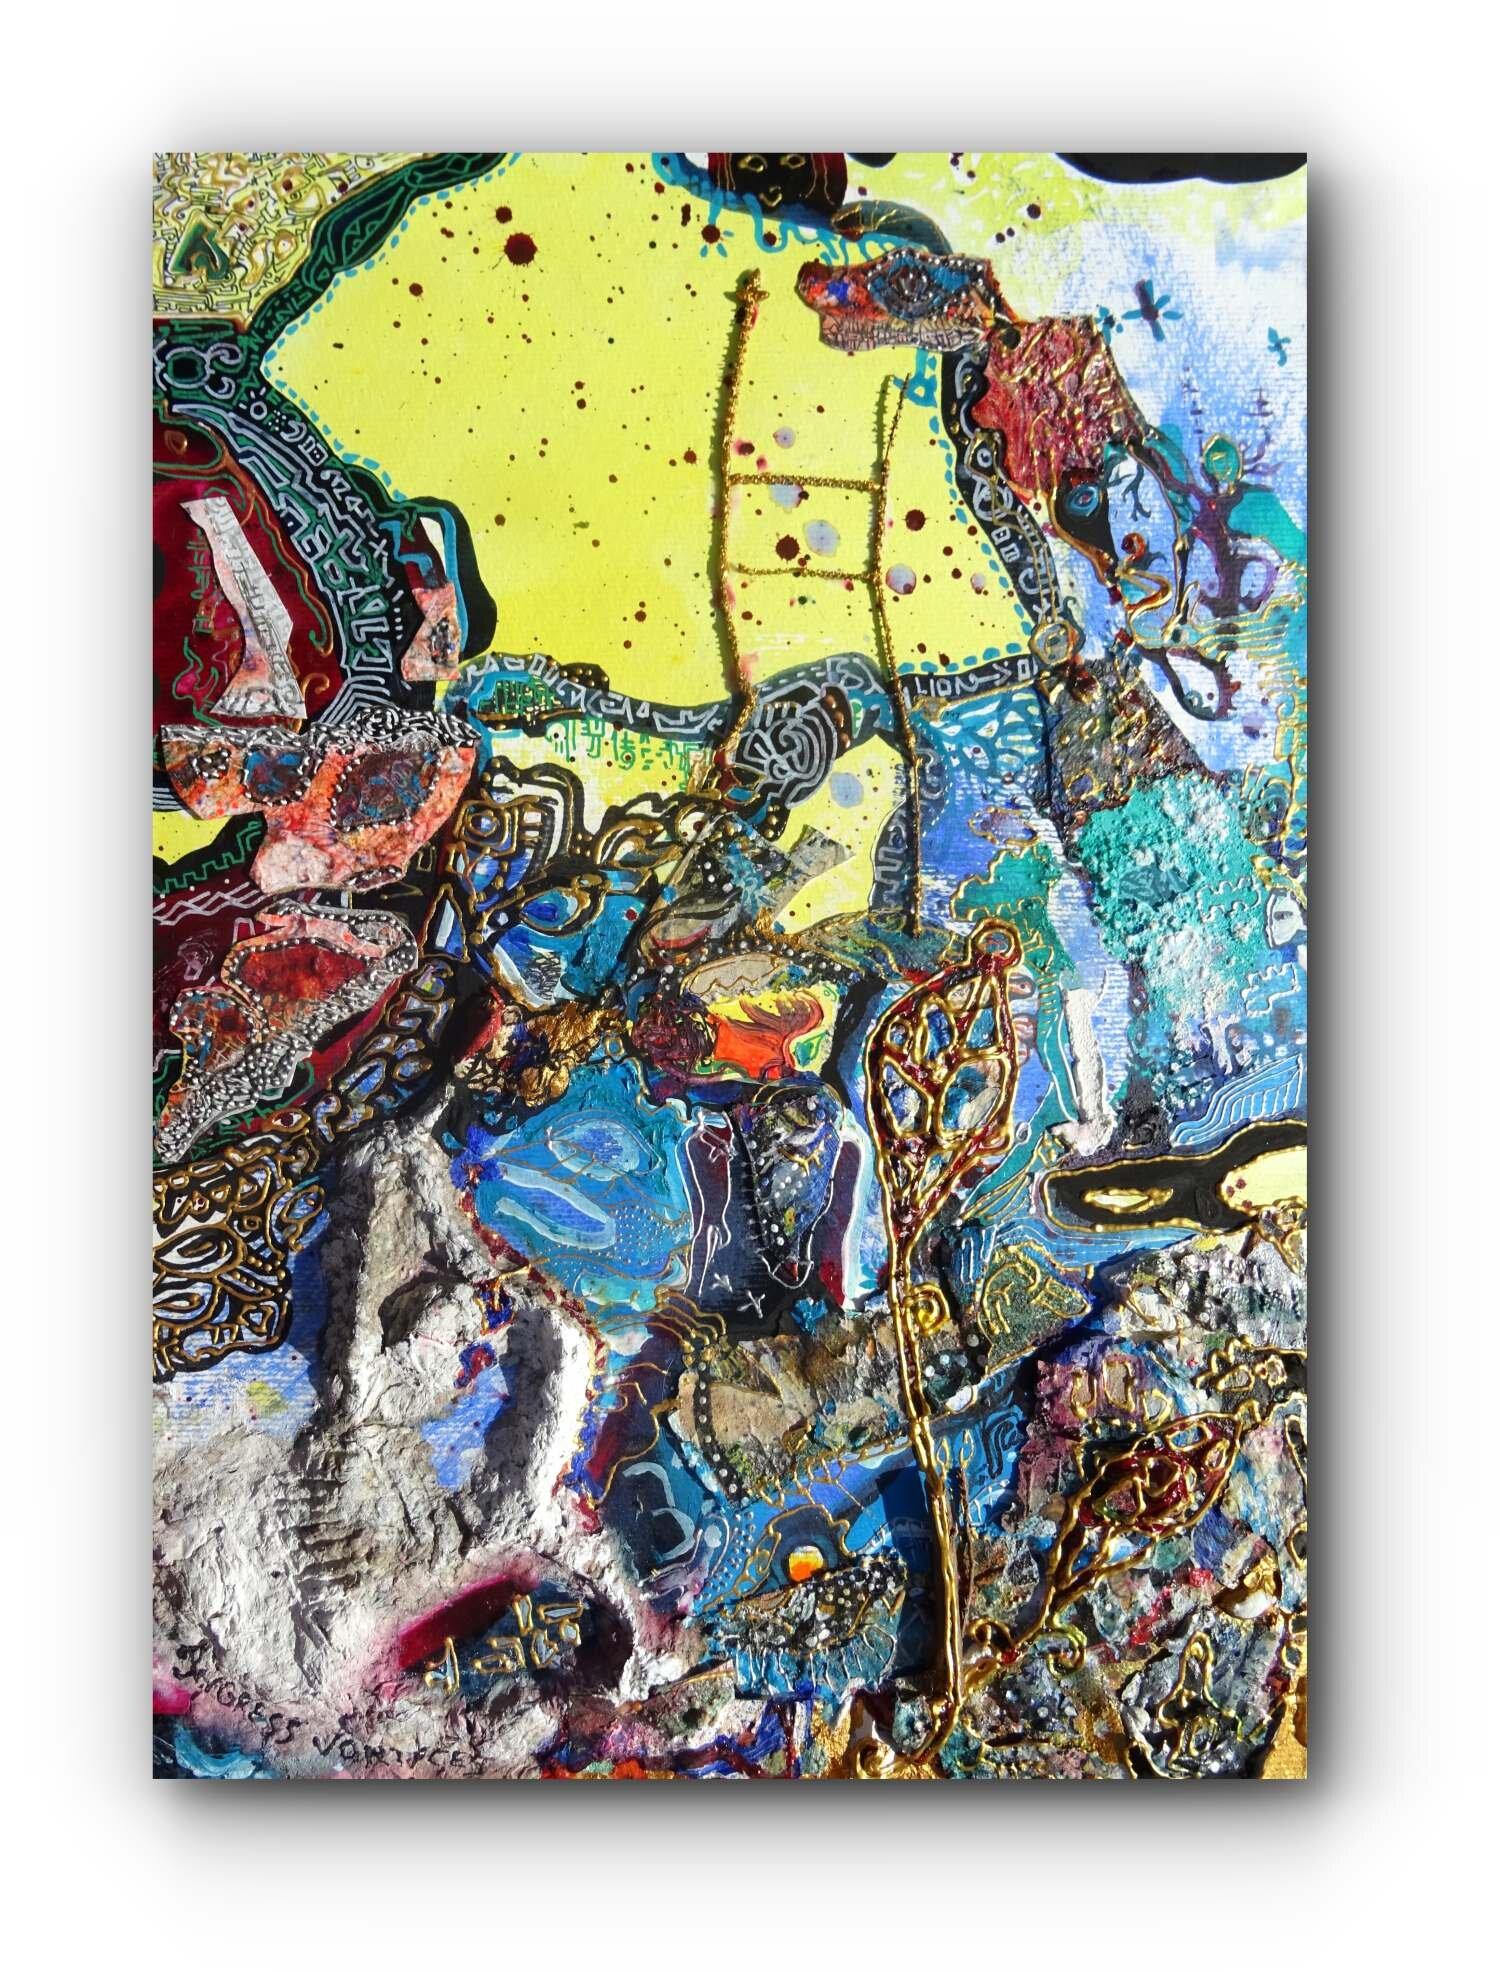 painting-celestial-summit-artist-duo-ingress-vortices.jpg